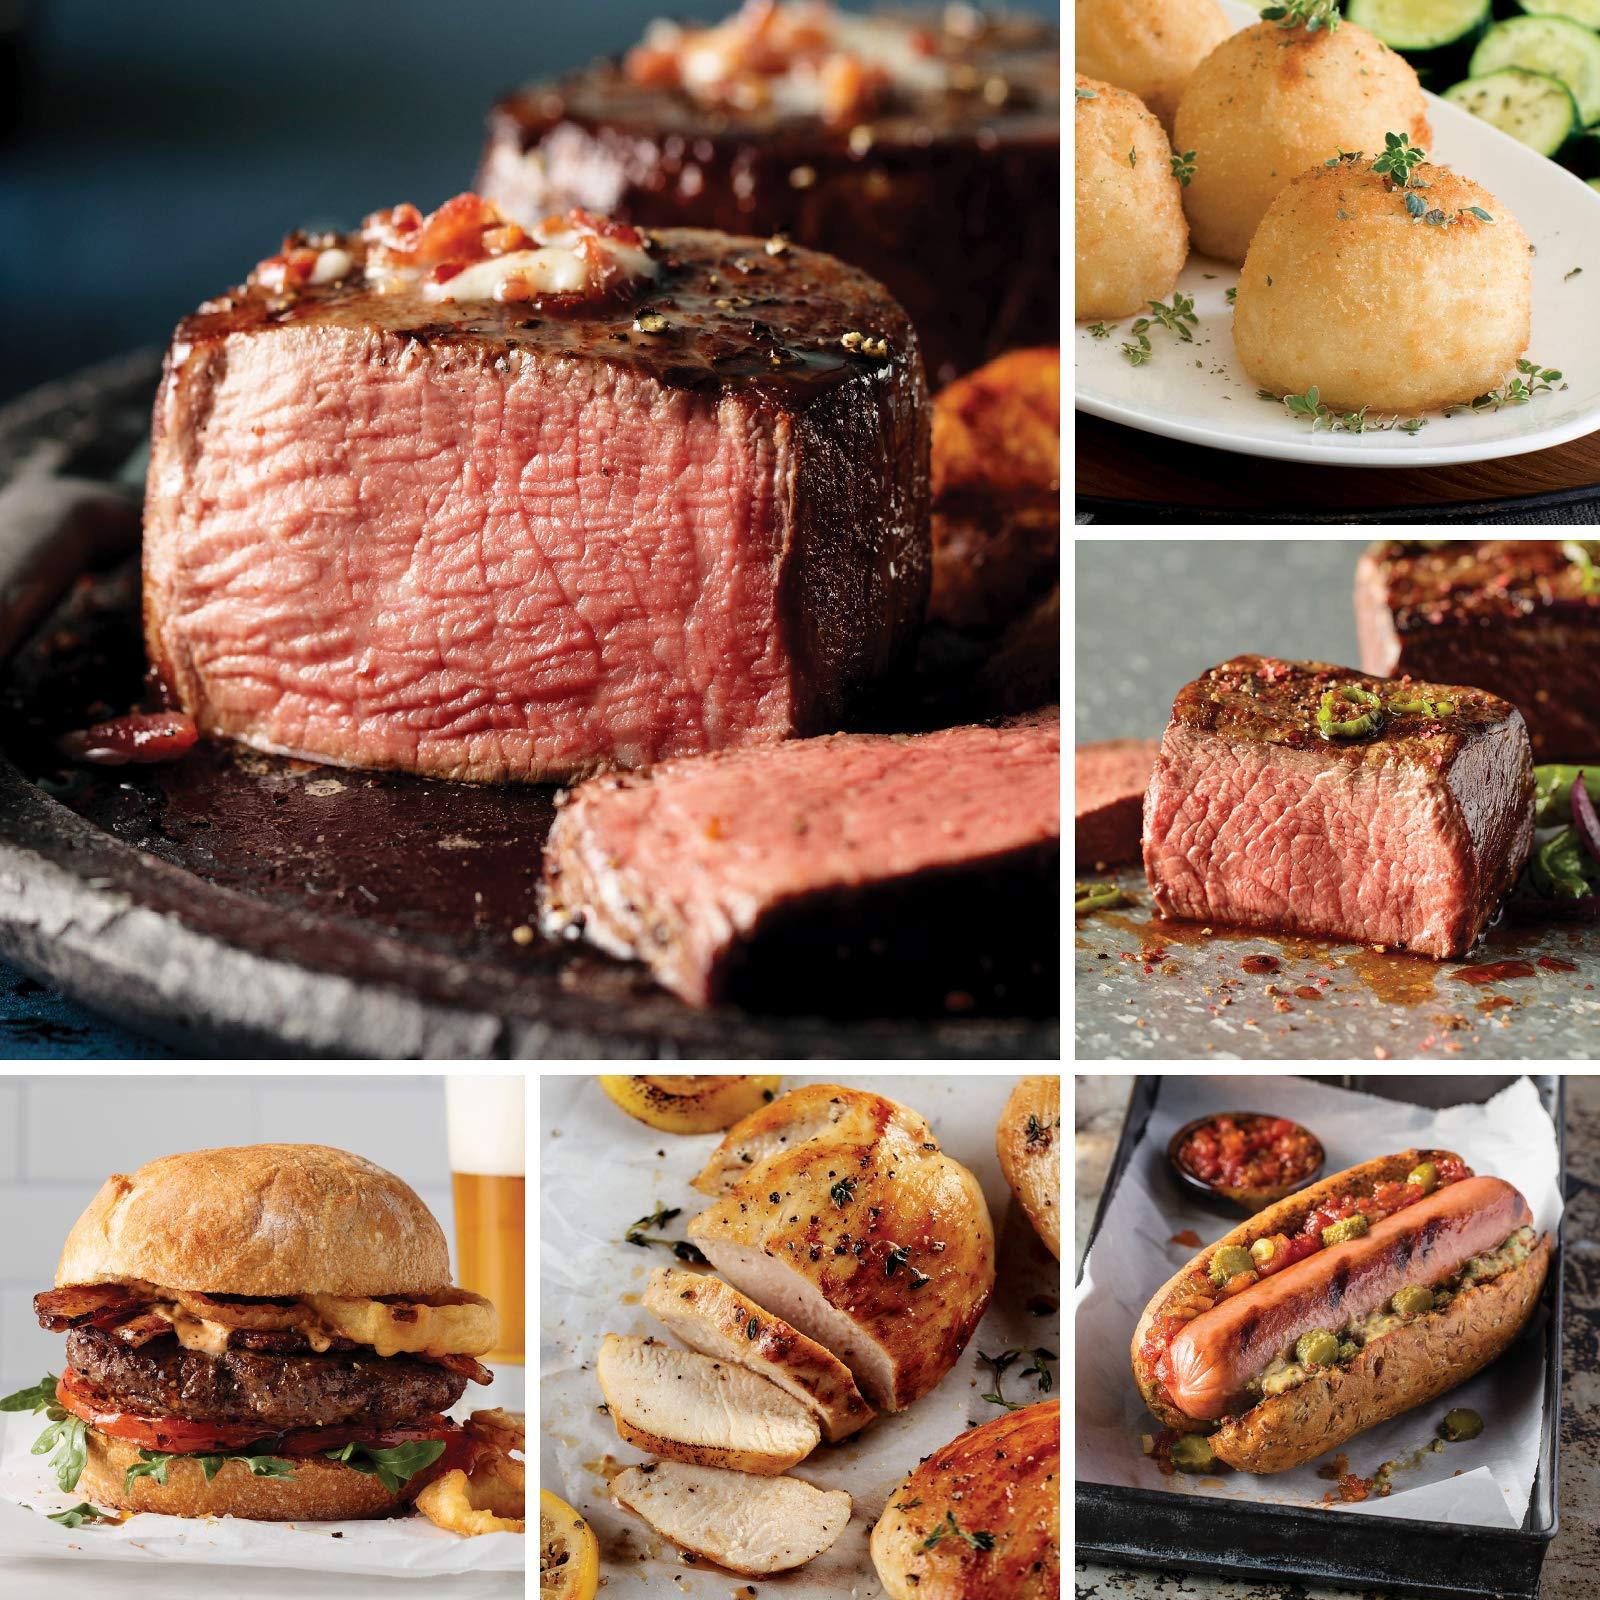 Omaha Steaks The Gourmet Sensation